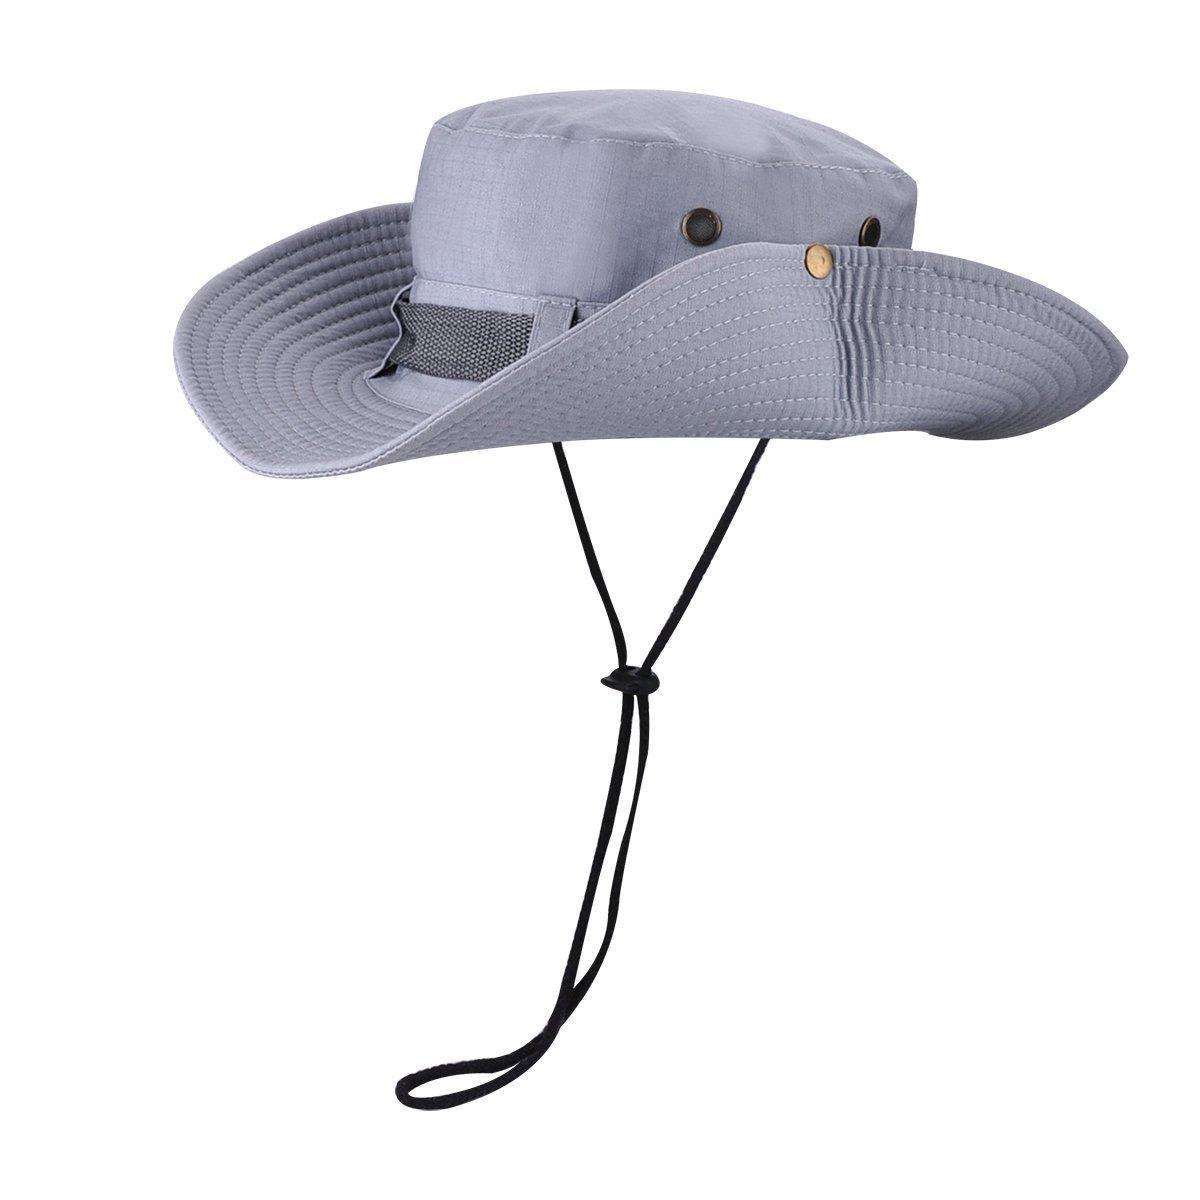 42da4c9510907 Get Quotations · Wide Brim Boonie Fishing Hat